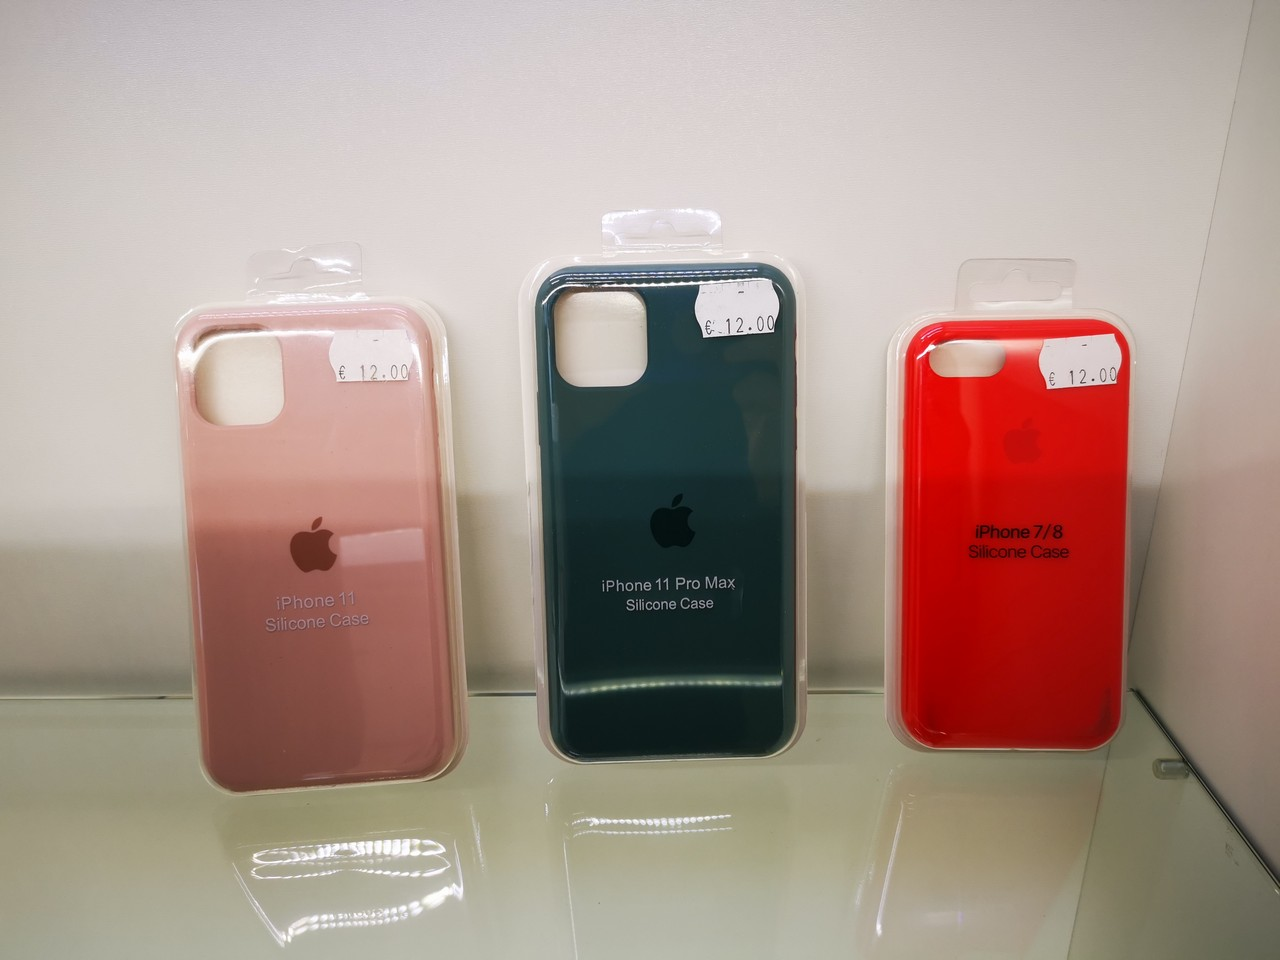 картинка iPhone 12 iPhone 11 iPhone Xr dėkliukai от магазина Одежда+